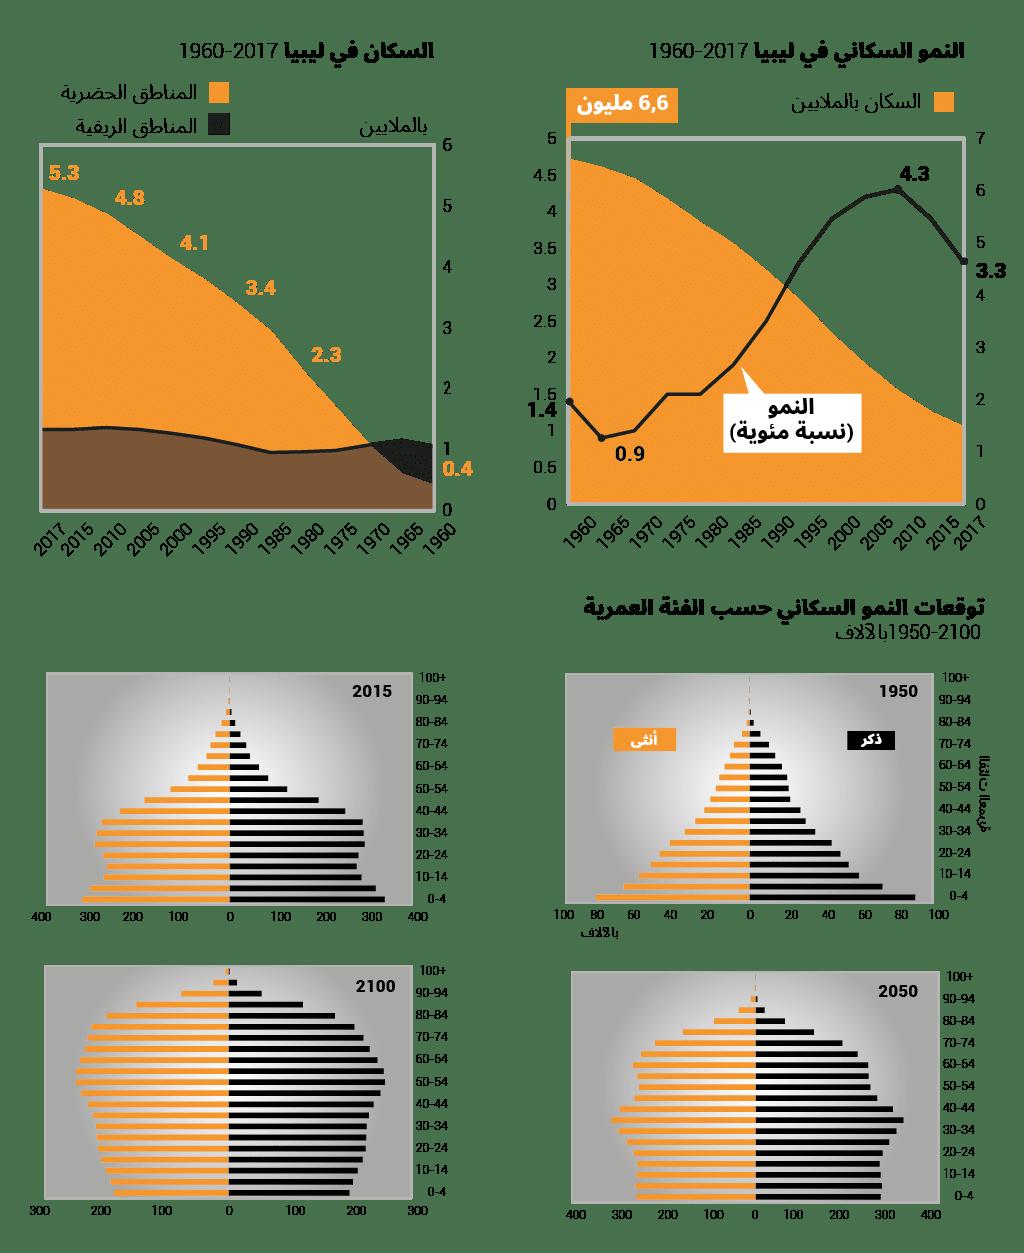 Libya population